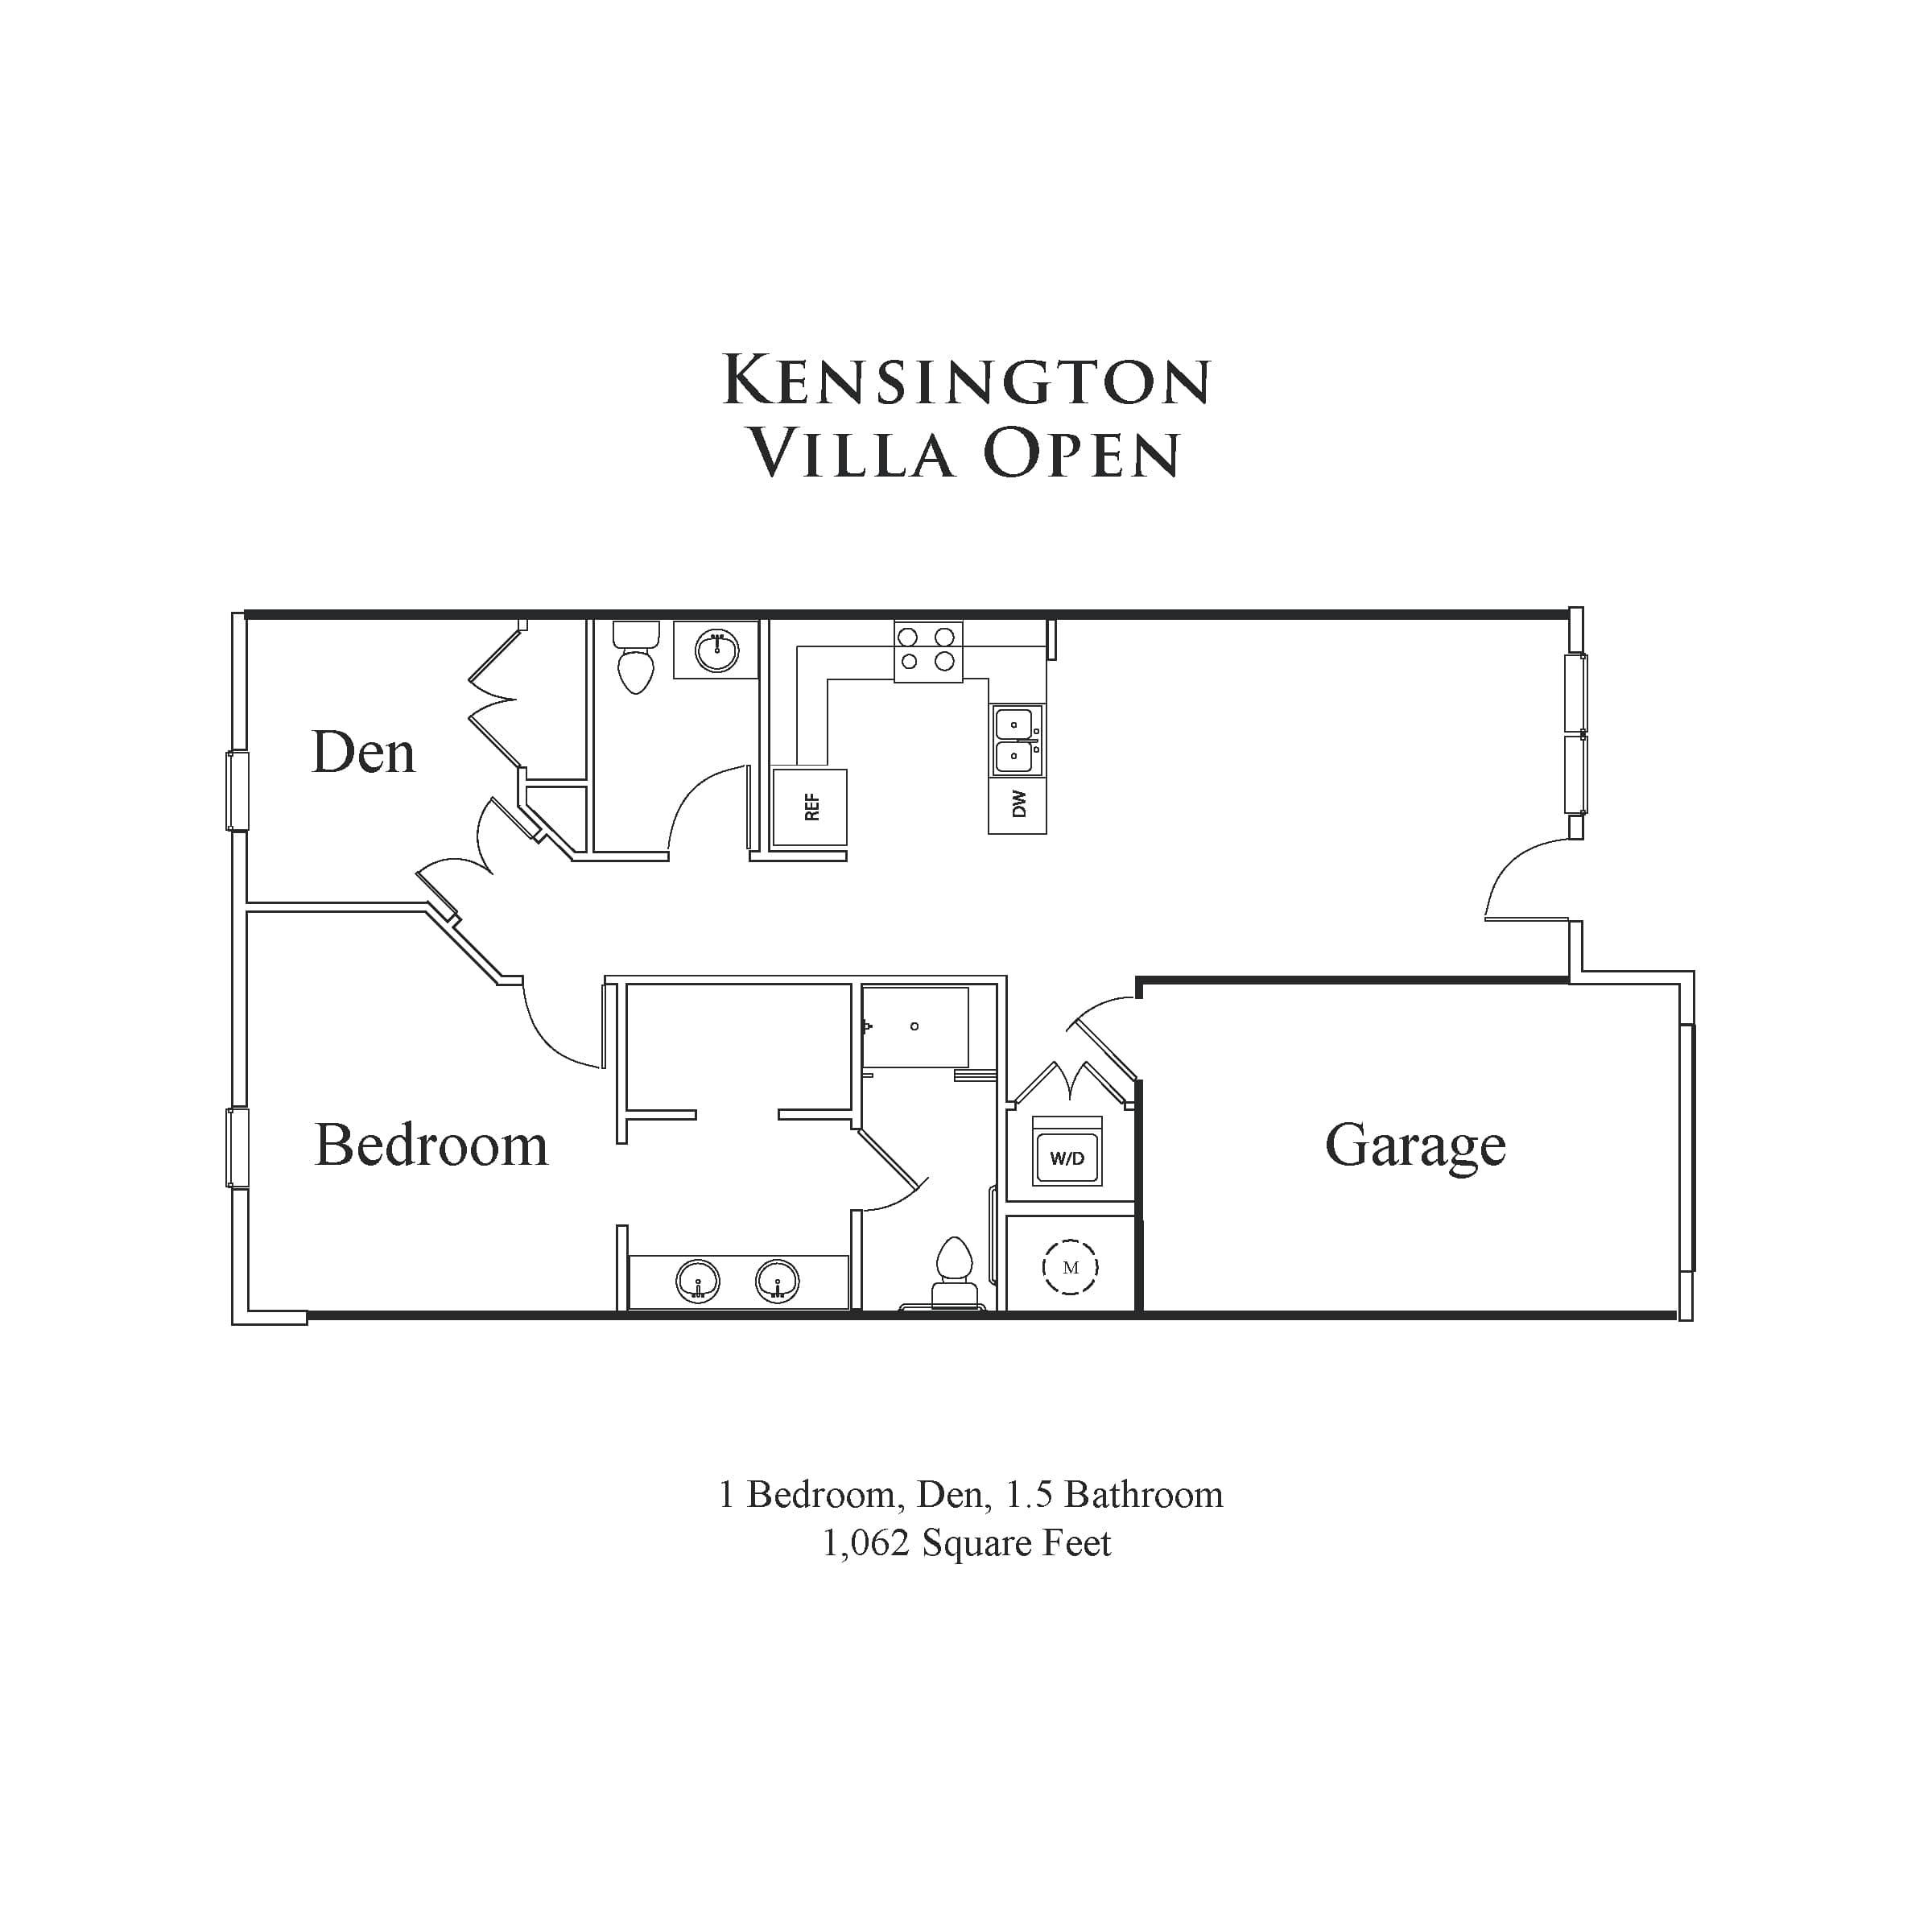 Kensington Villa – Open